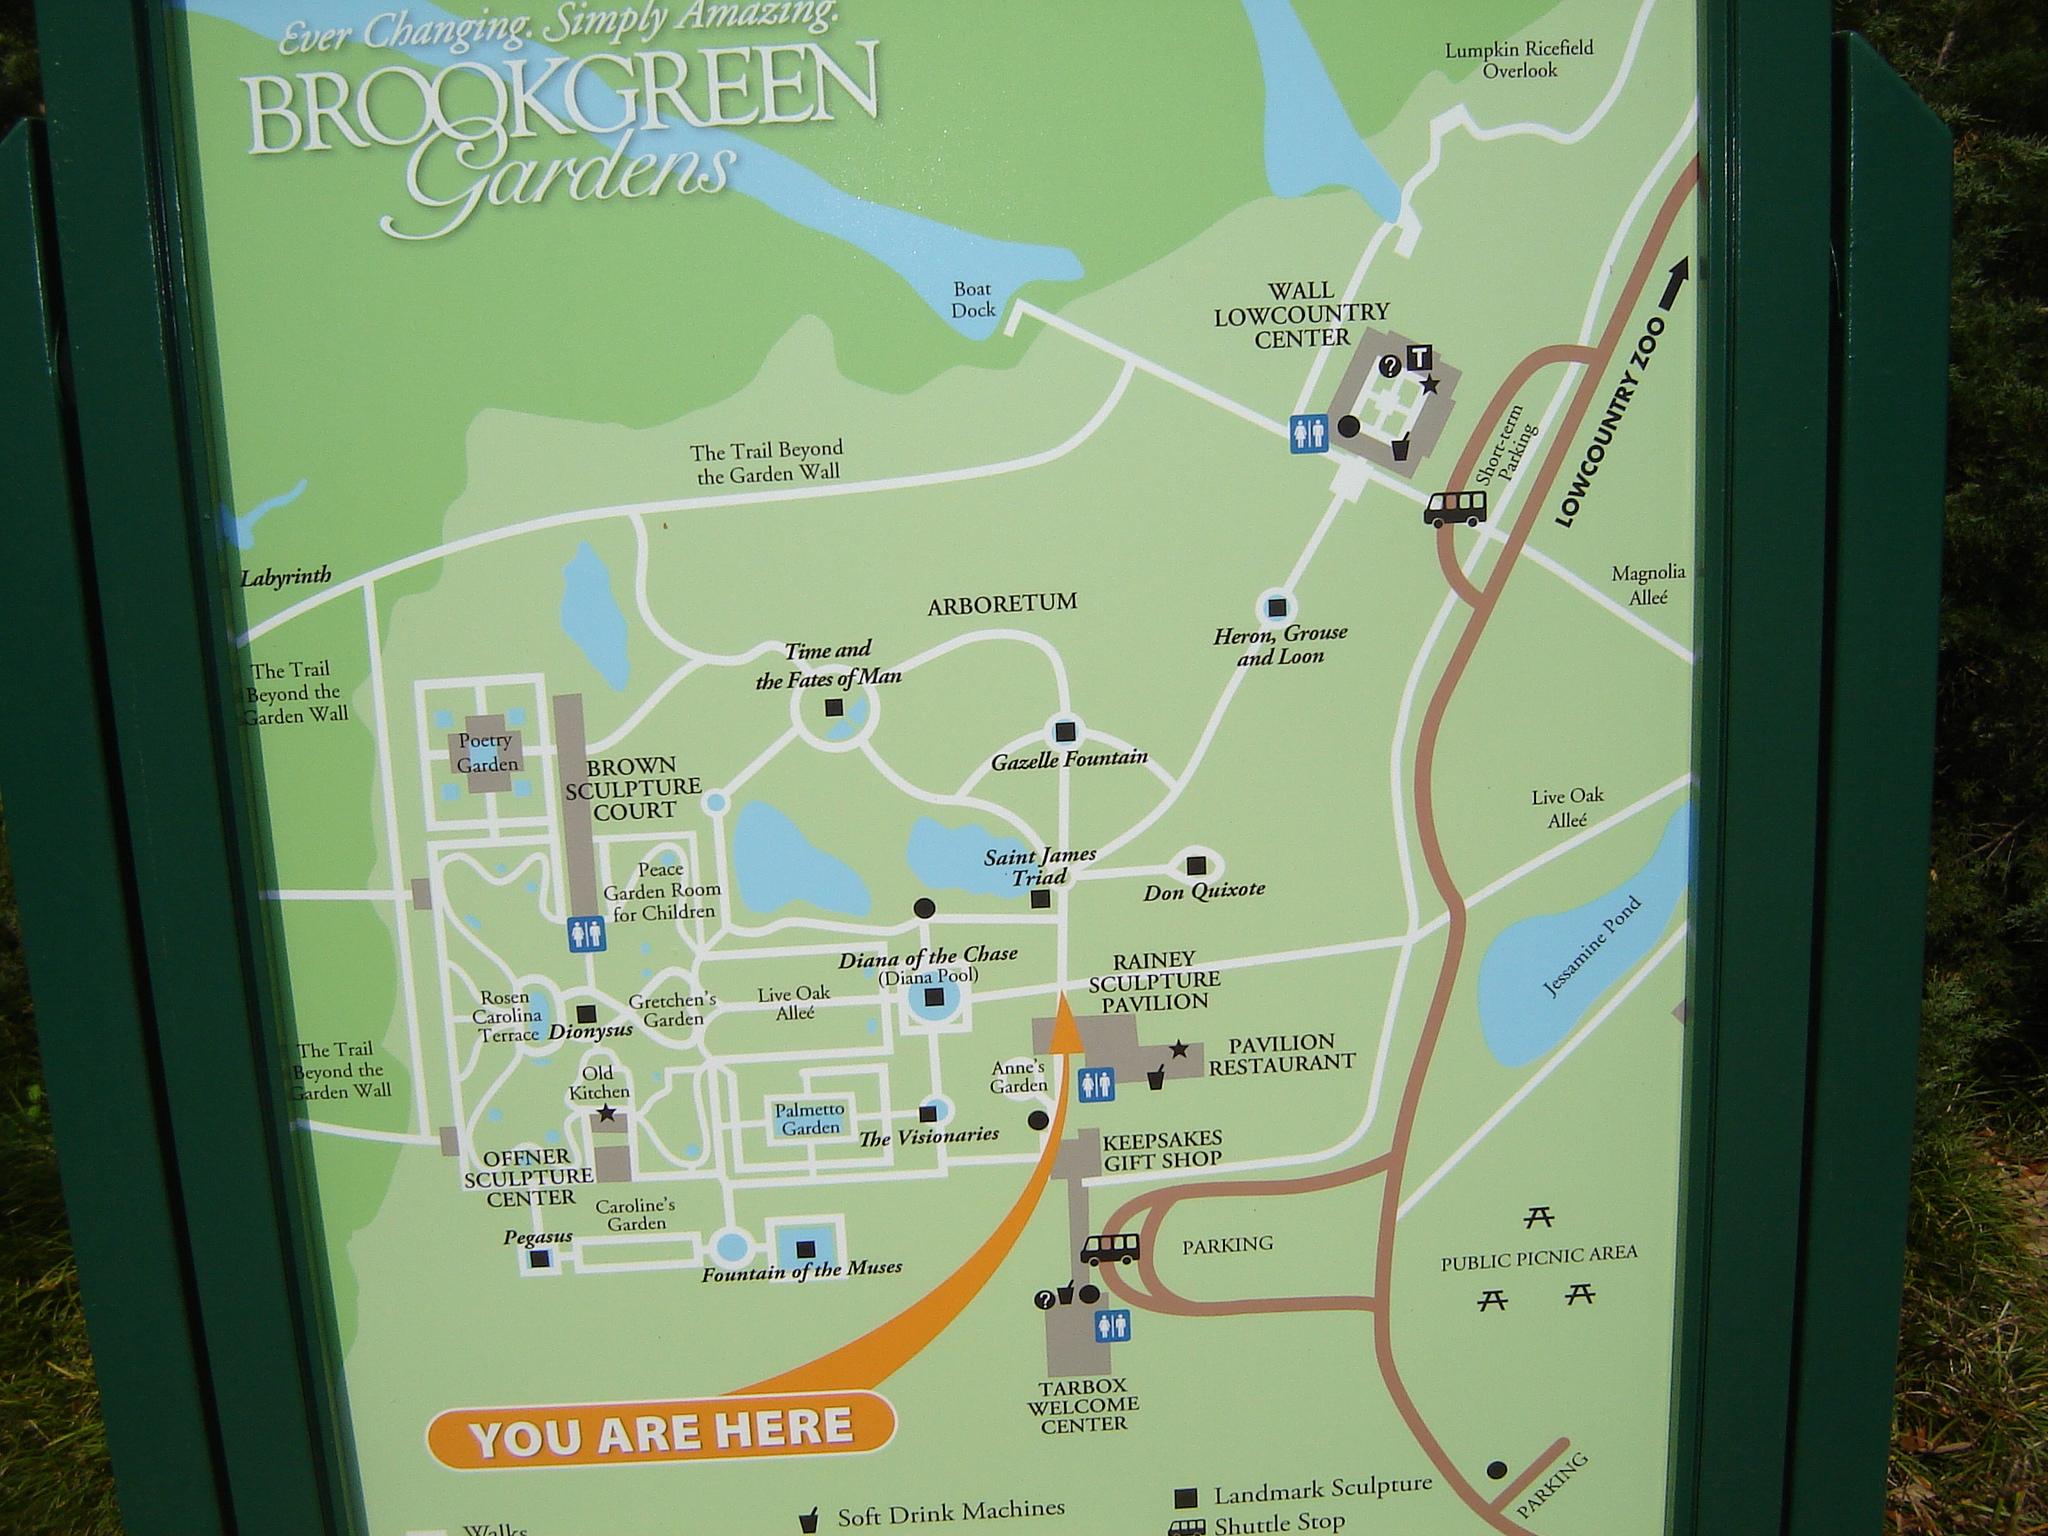 Dsc08613 | Nice Orientation Map Of Brookgreen Gardens. | Pete - Brookgreen Gardens Printable Map